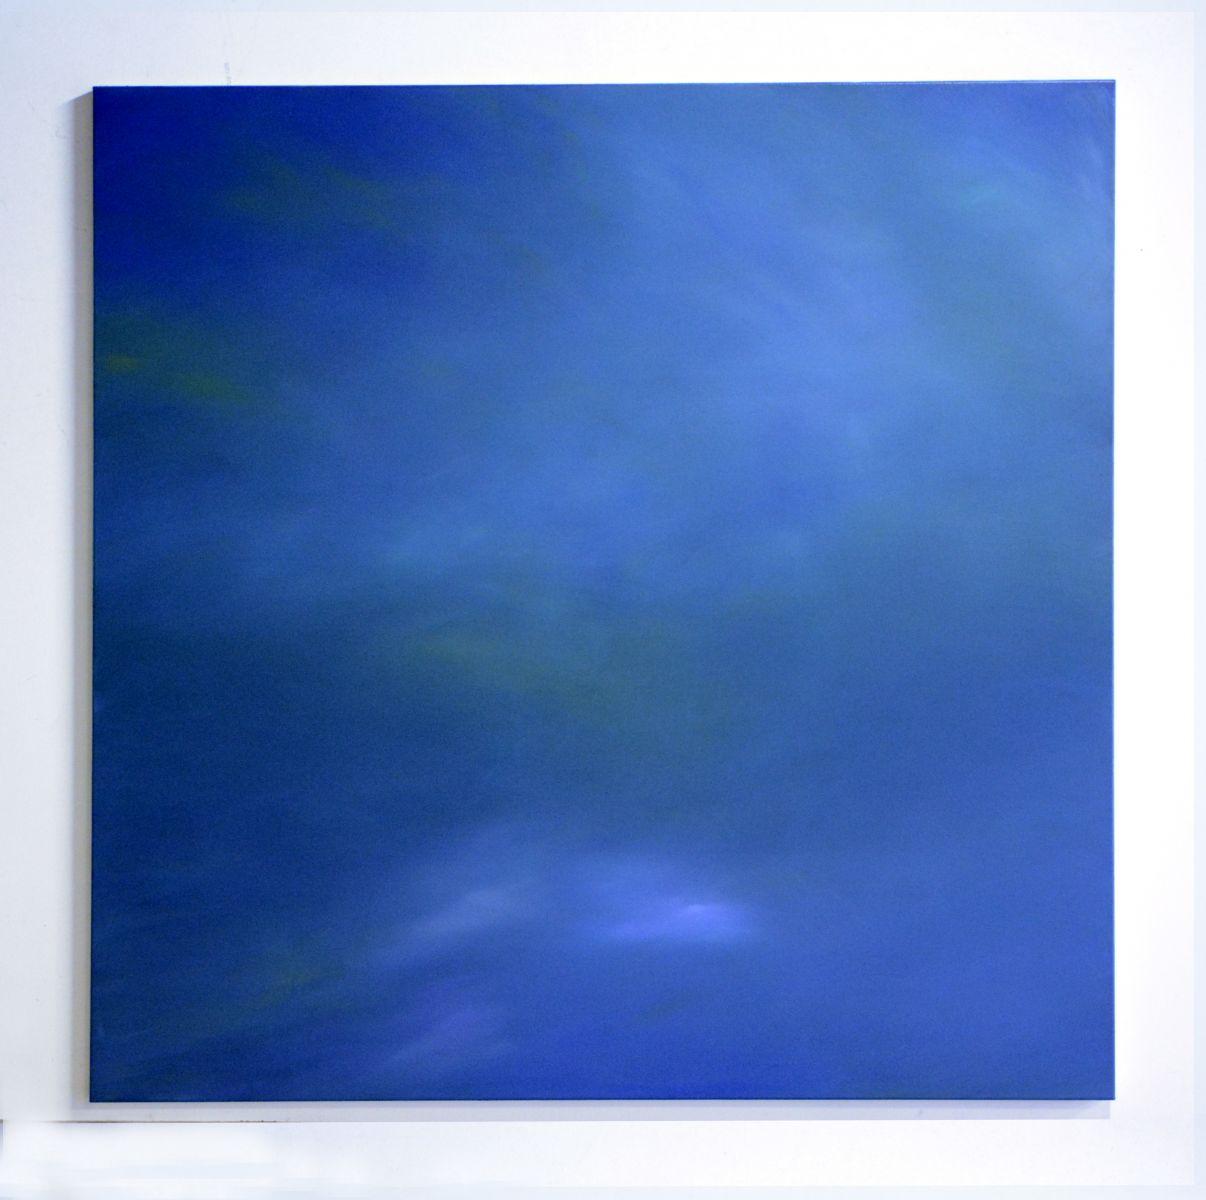 Blue - Christian Eder - Malerei auf Leinwand